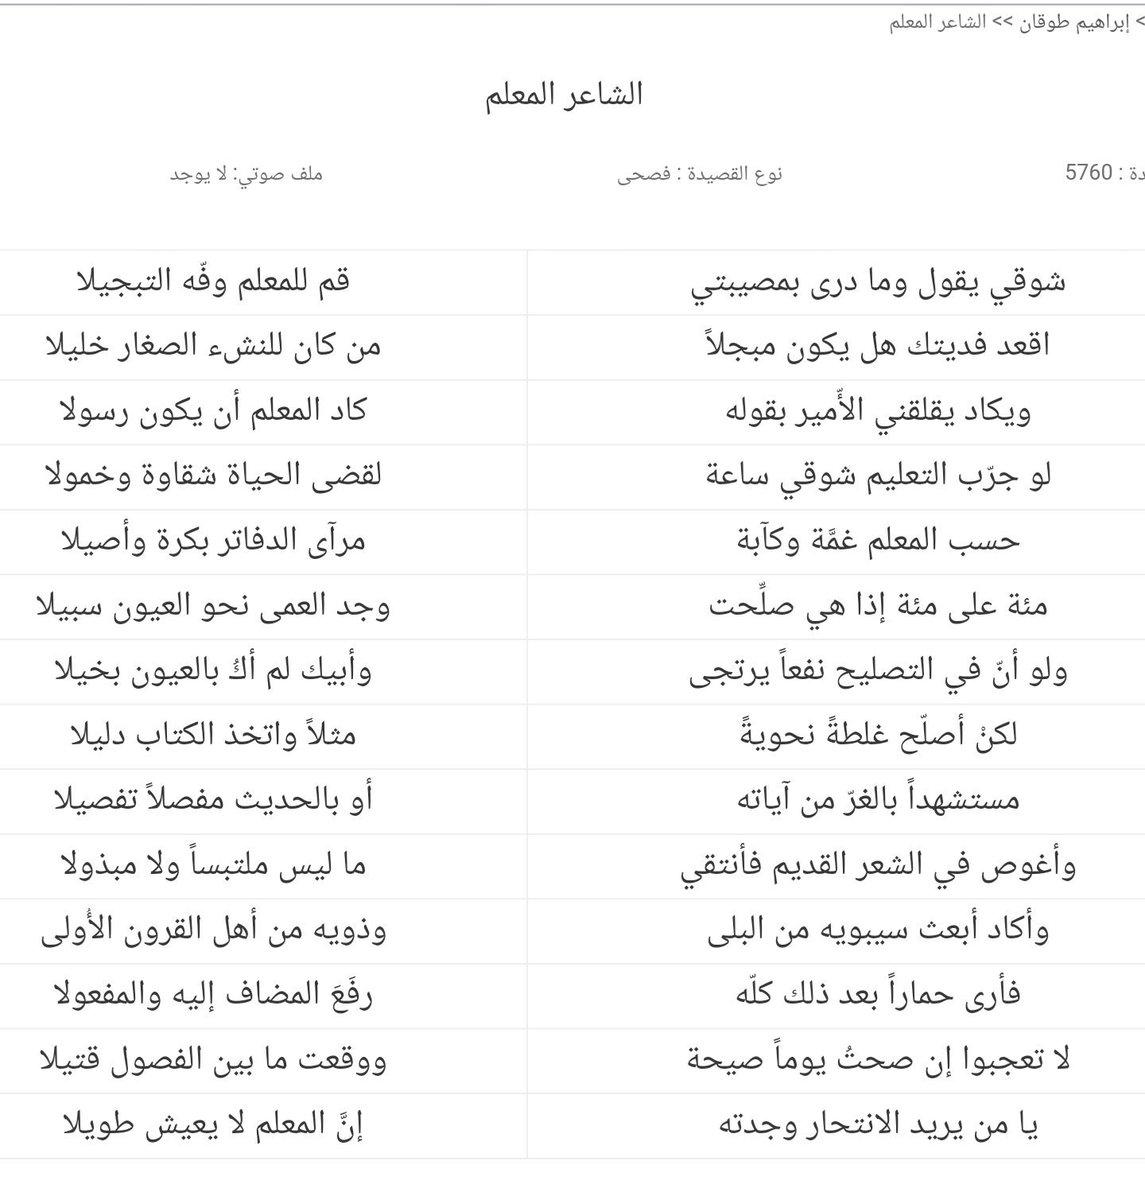 د بادي العنزي On Twitter أحمد شوقي شاعر مرهف قال في المعلم